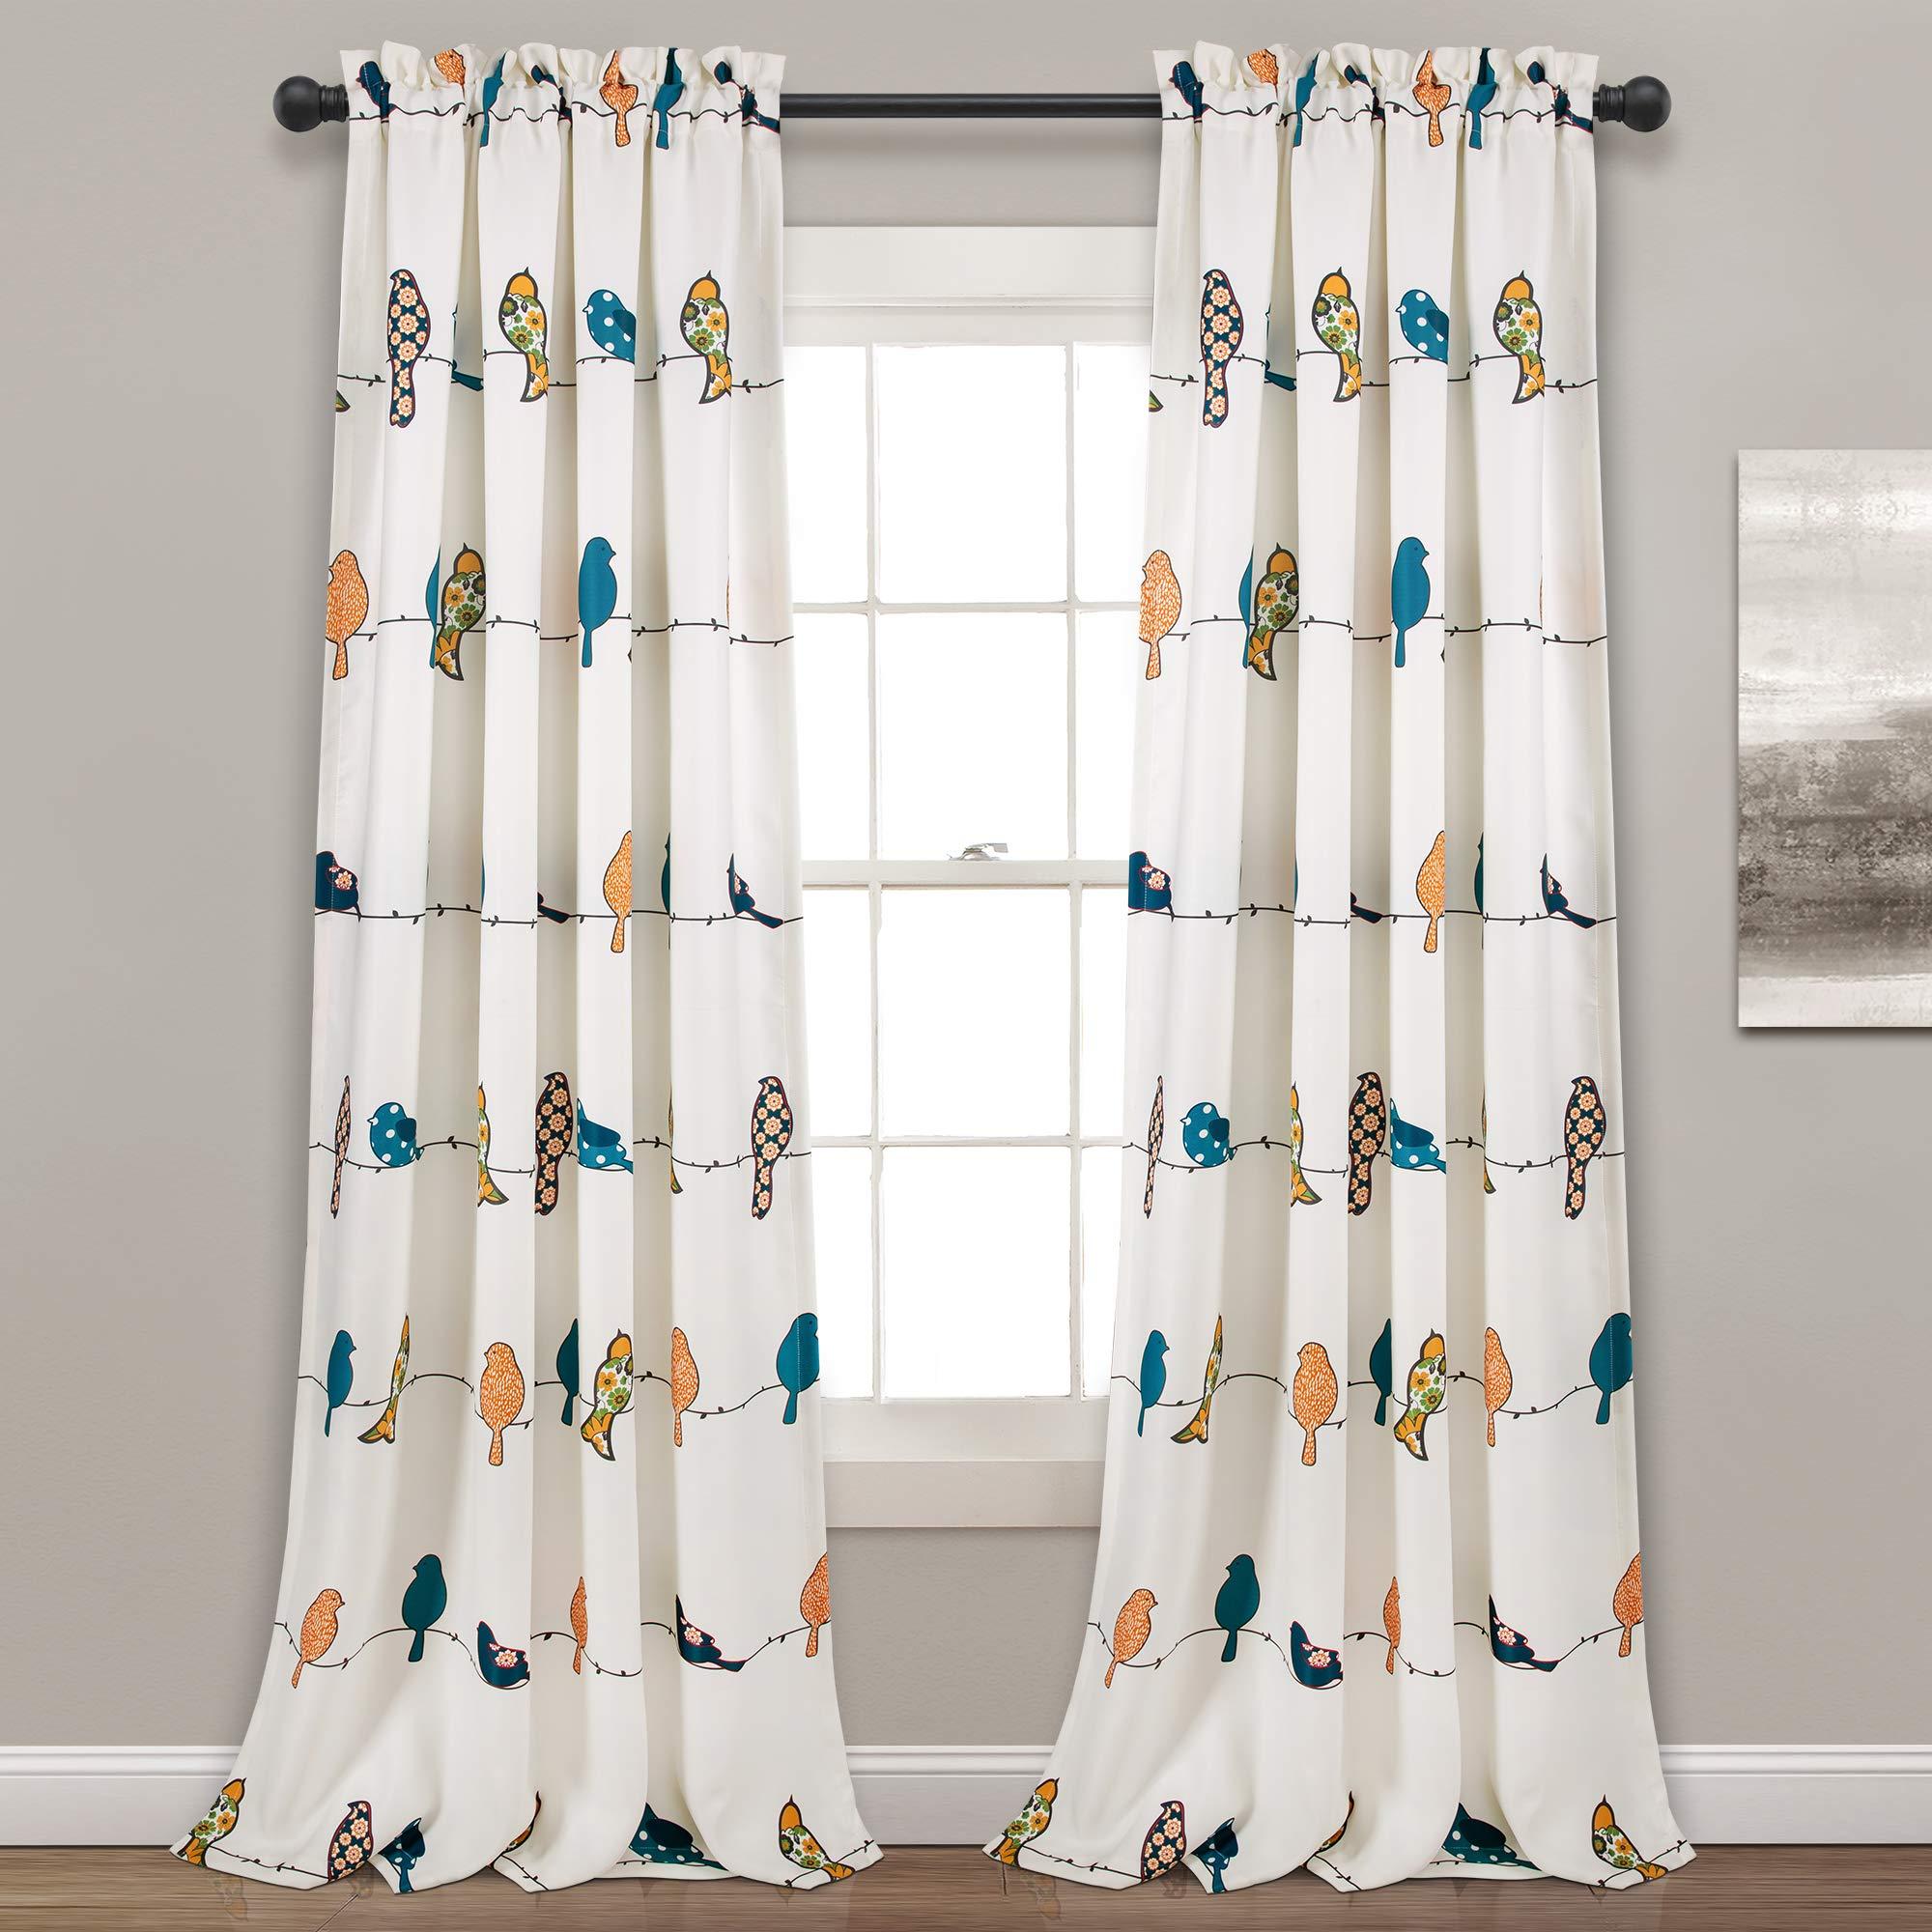 Lush Decor Rowley Birds Curtains Room Darkening Window Panel Set for Living, Dining, Bedroom (Pair), 95'' x 52'', Multicolored, L, Multi by Lush Decor